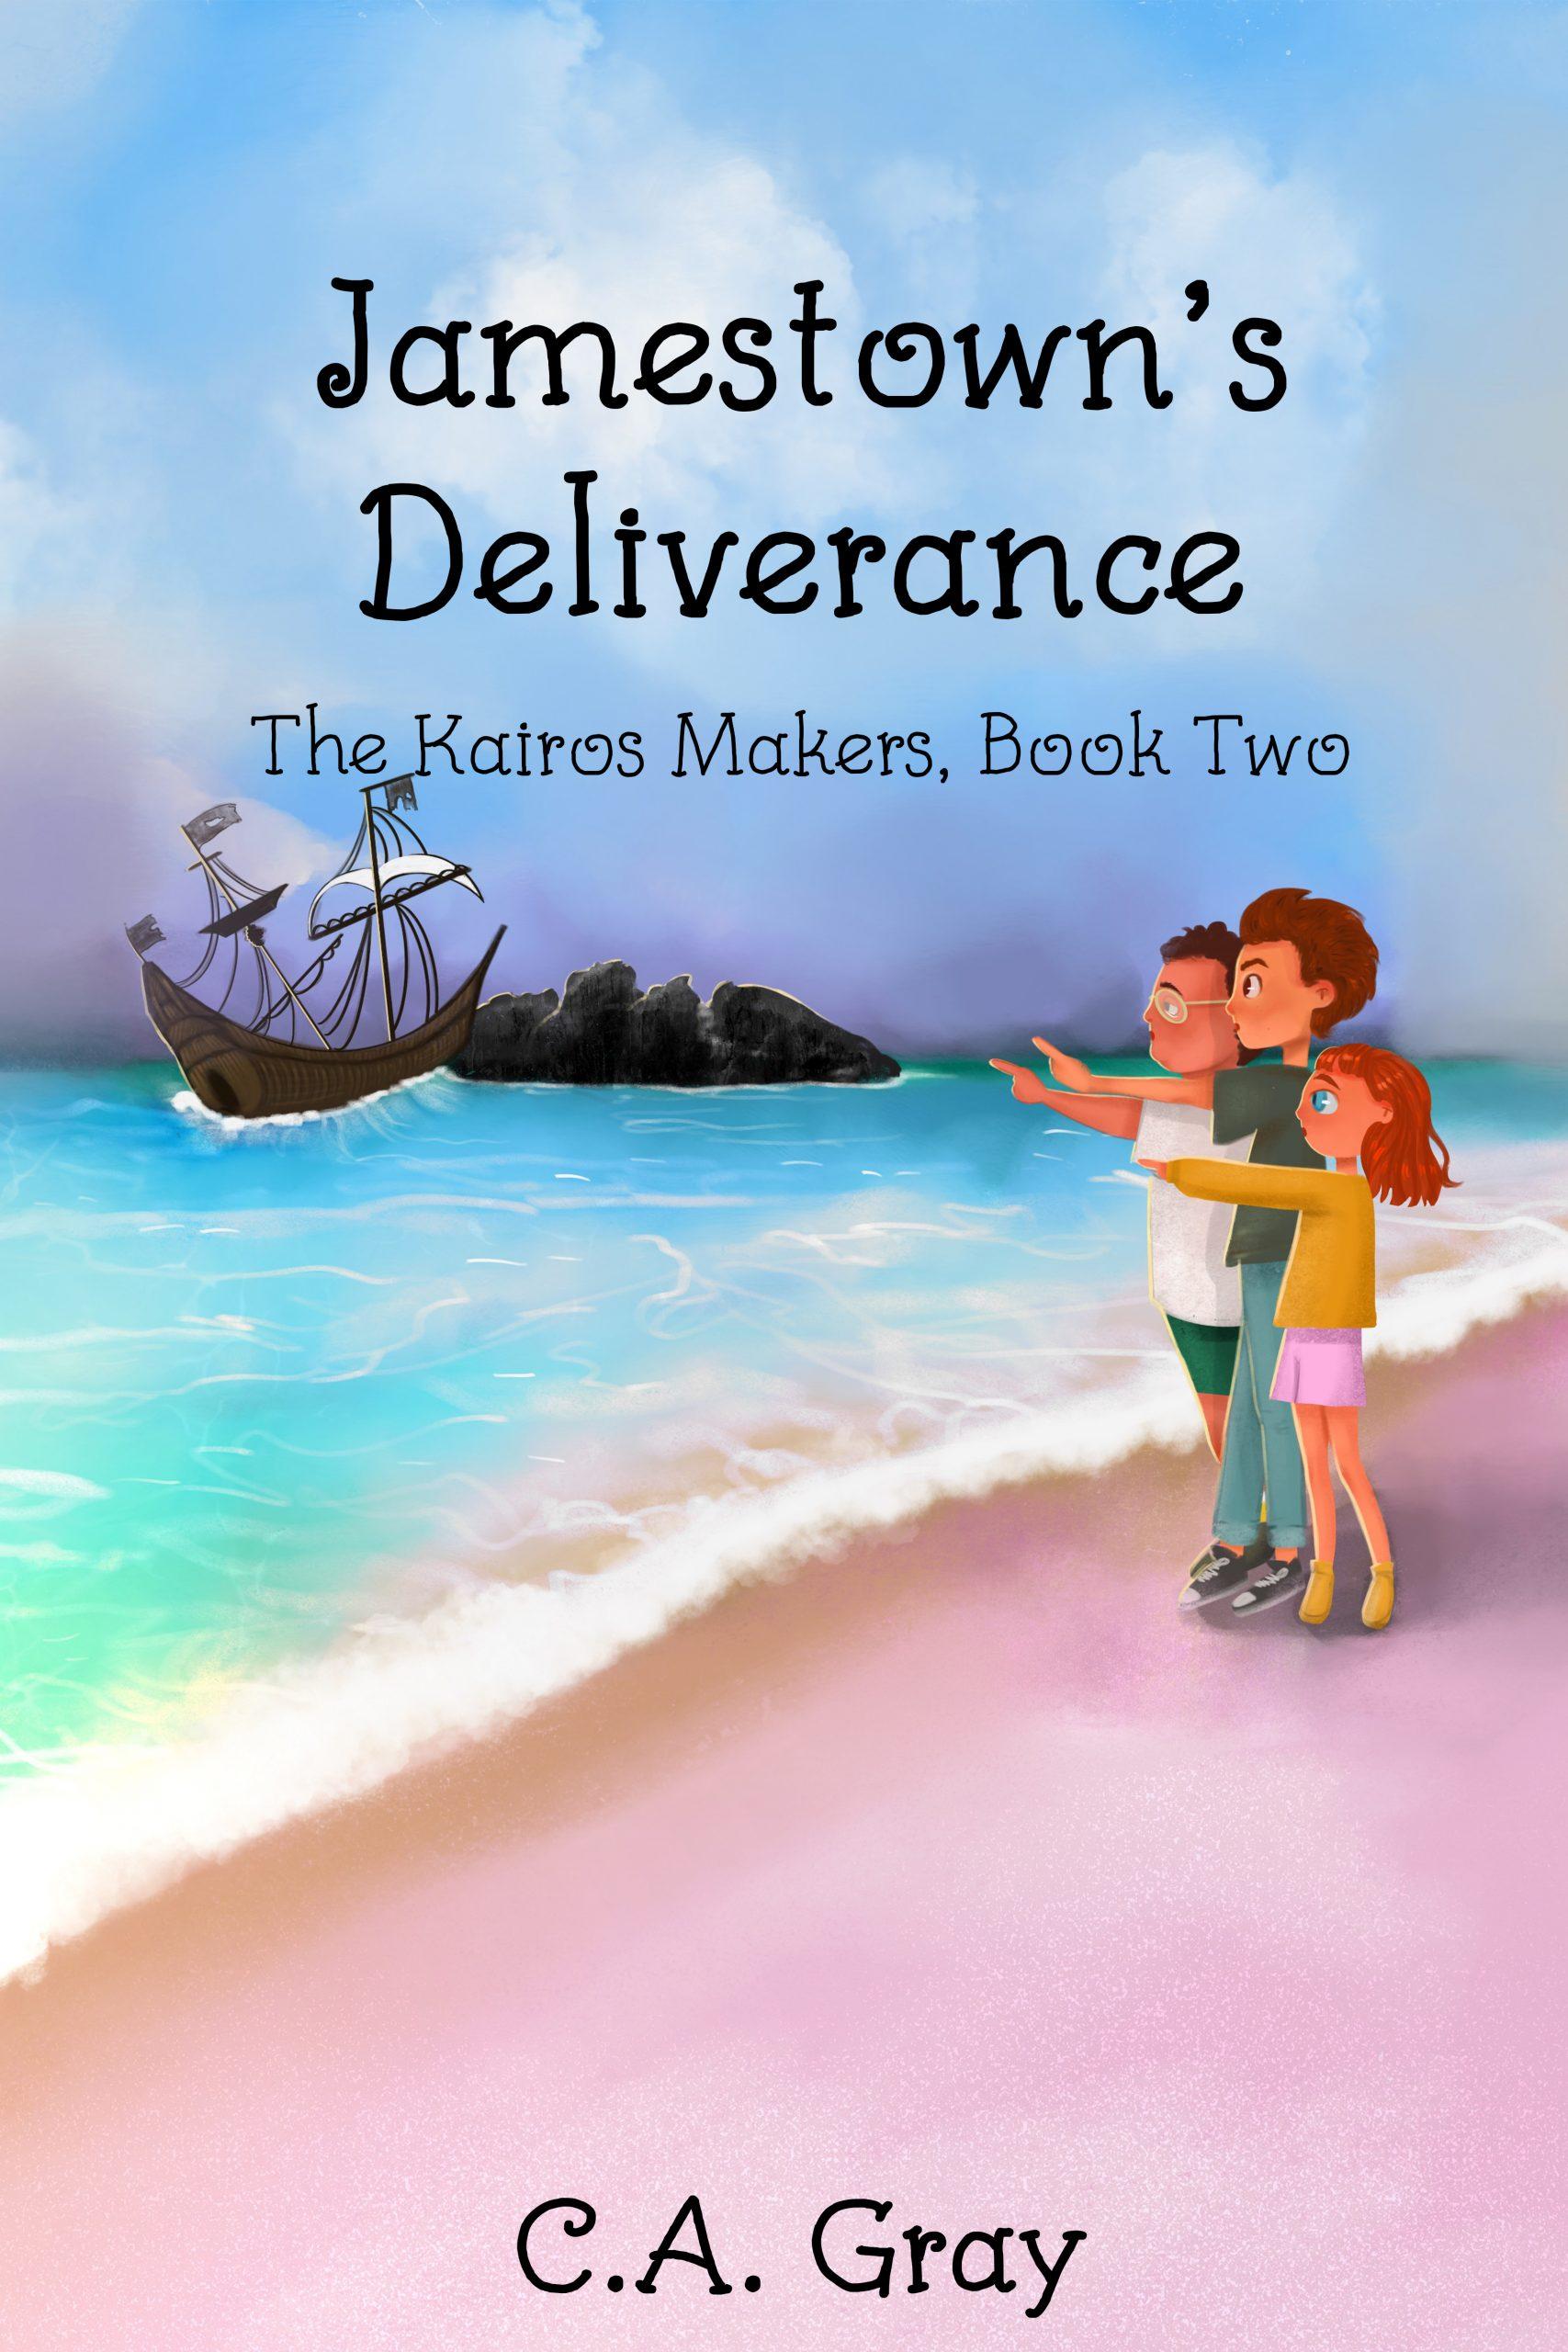 Jamestown's Deliverance